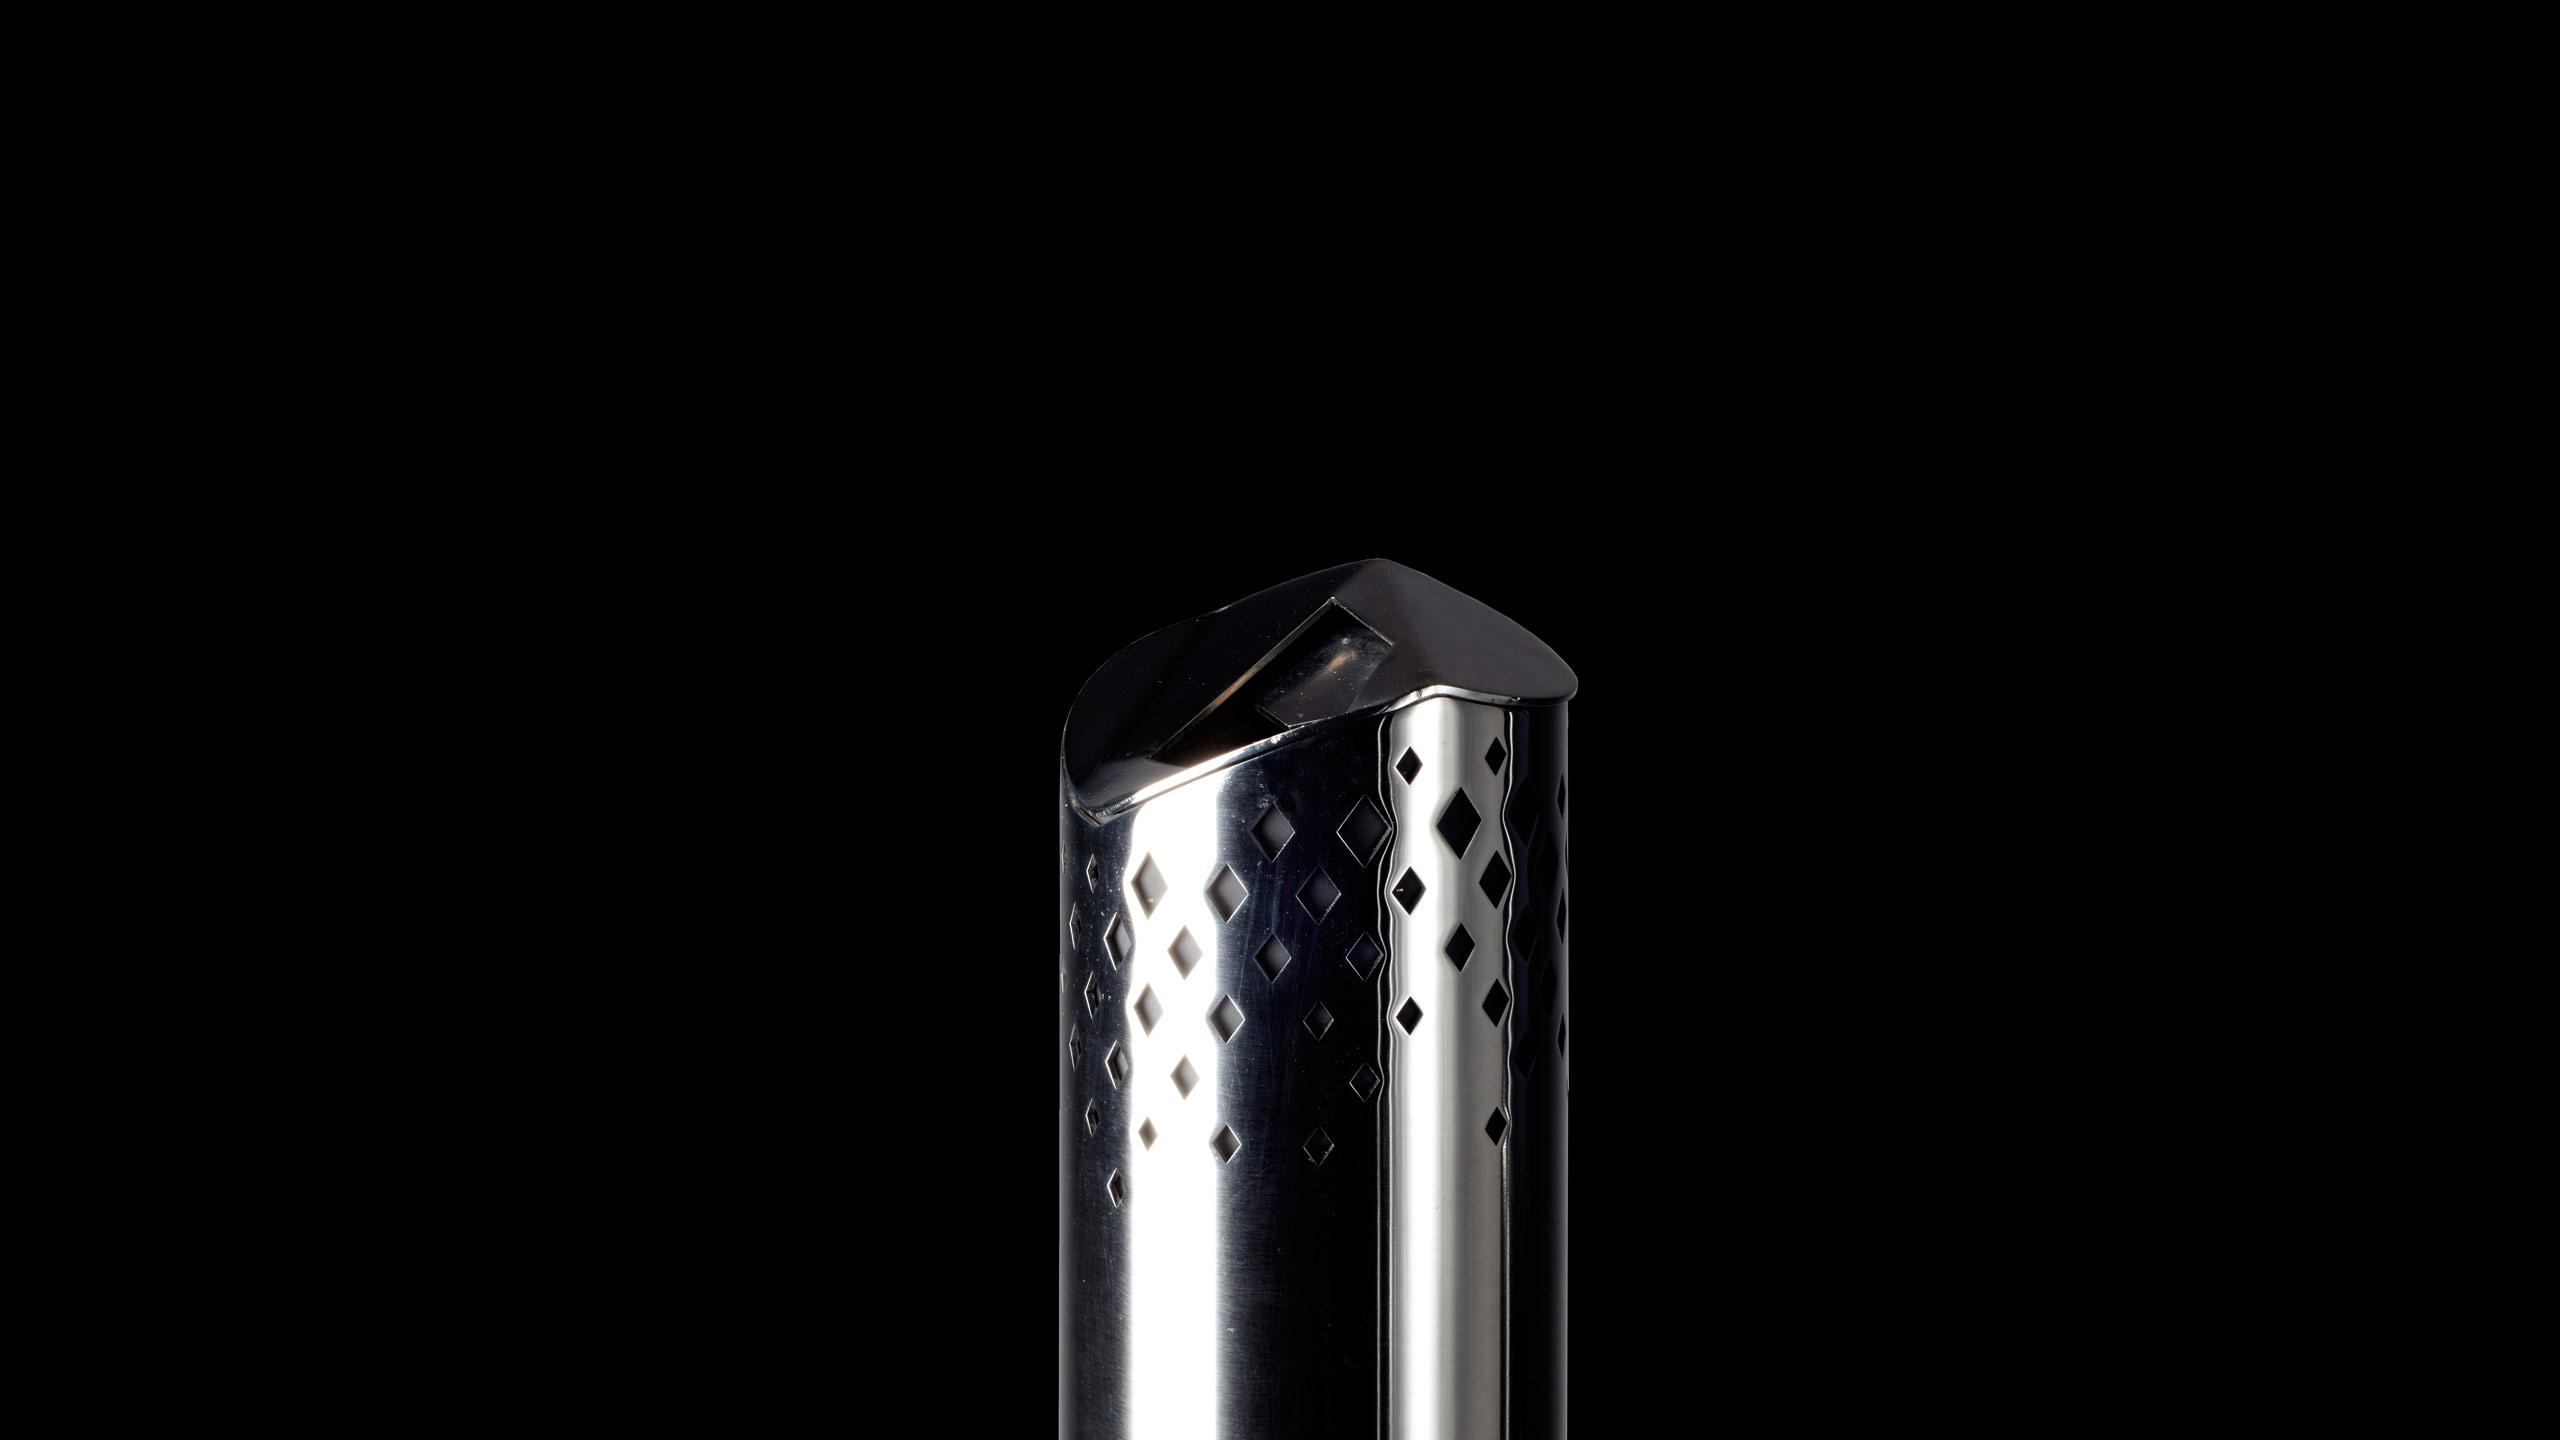 cendrier manques 2 objets publics mobilier urbain design franck magné